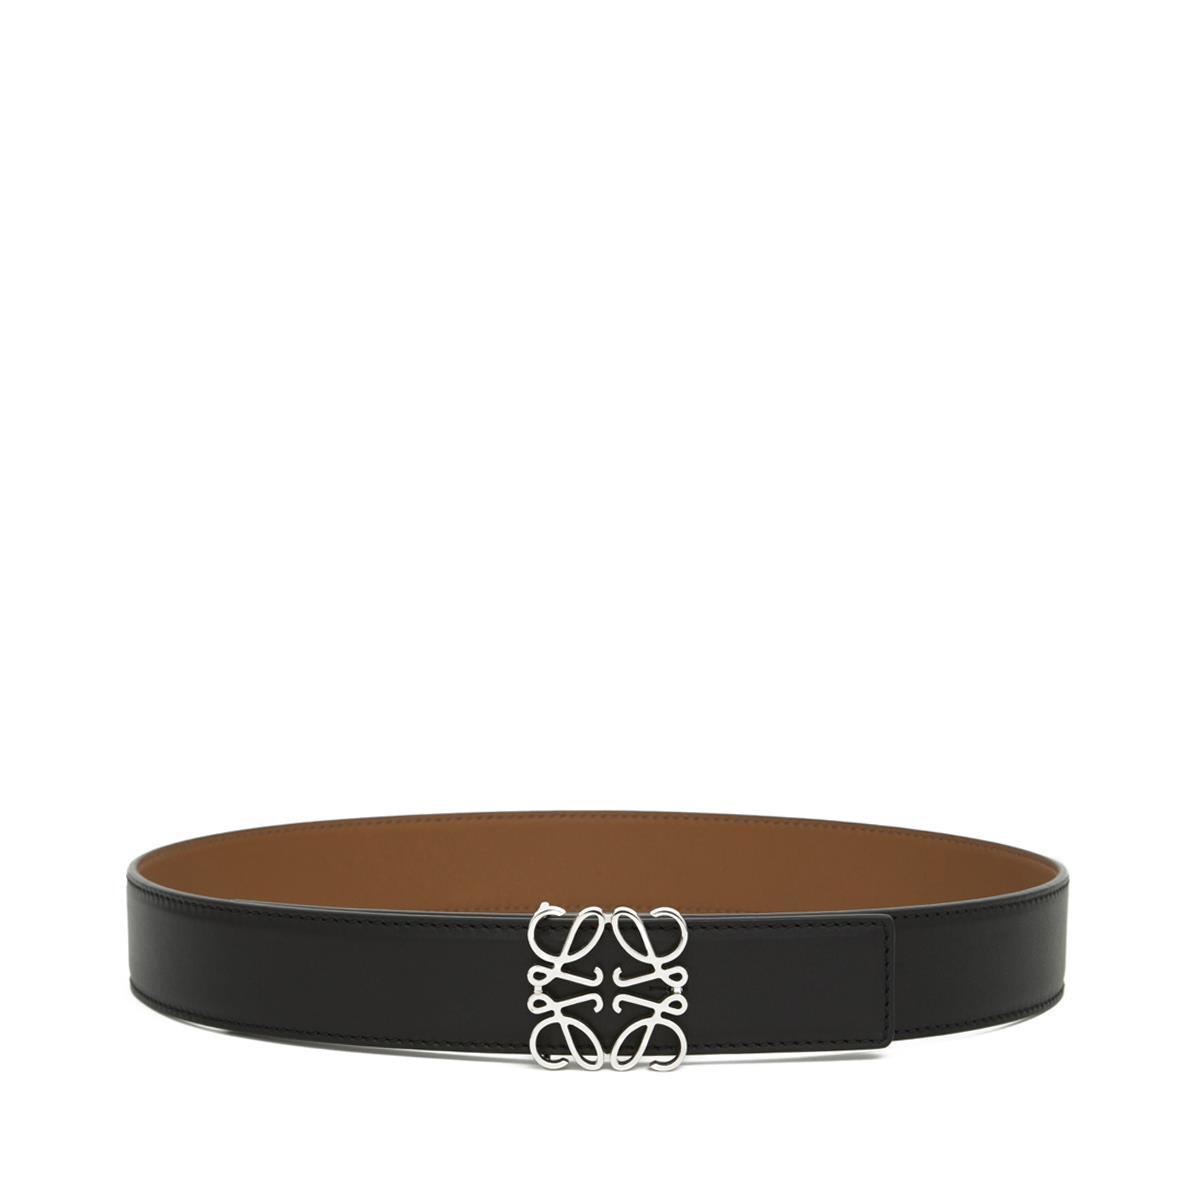 LOEWE Cinturon Anagrama 3.2Cm Negro/Bronceado/Paladio front